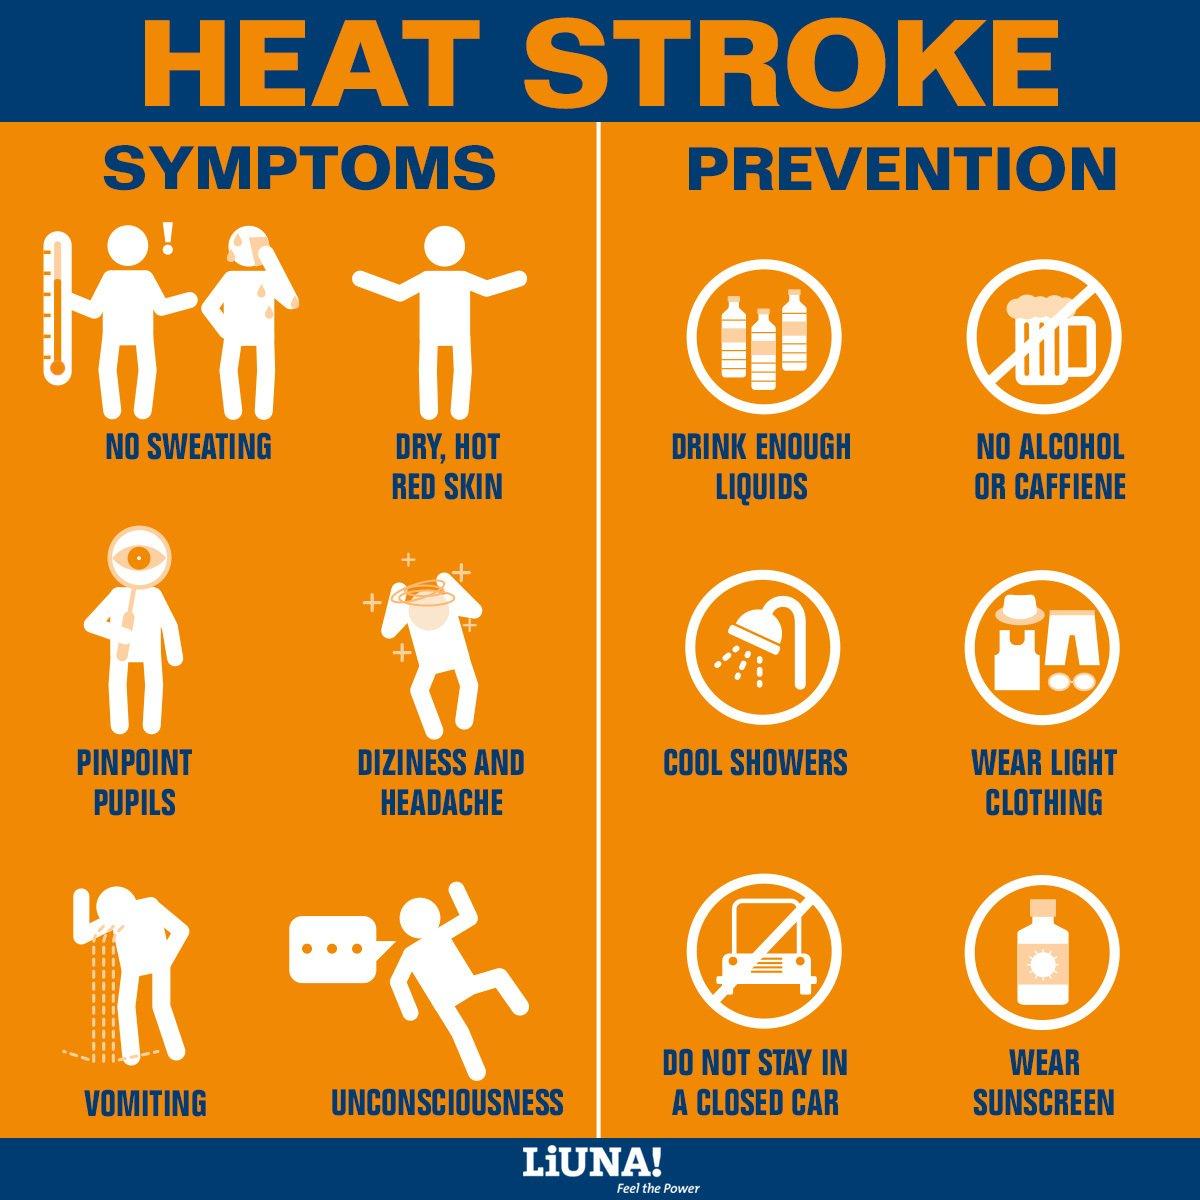 Your Home Heating Safety Tips: LiUNA Local 55 (@LiUNALocal55)